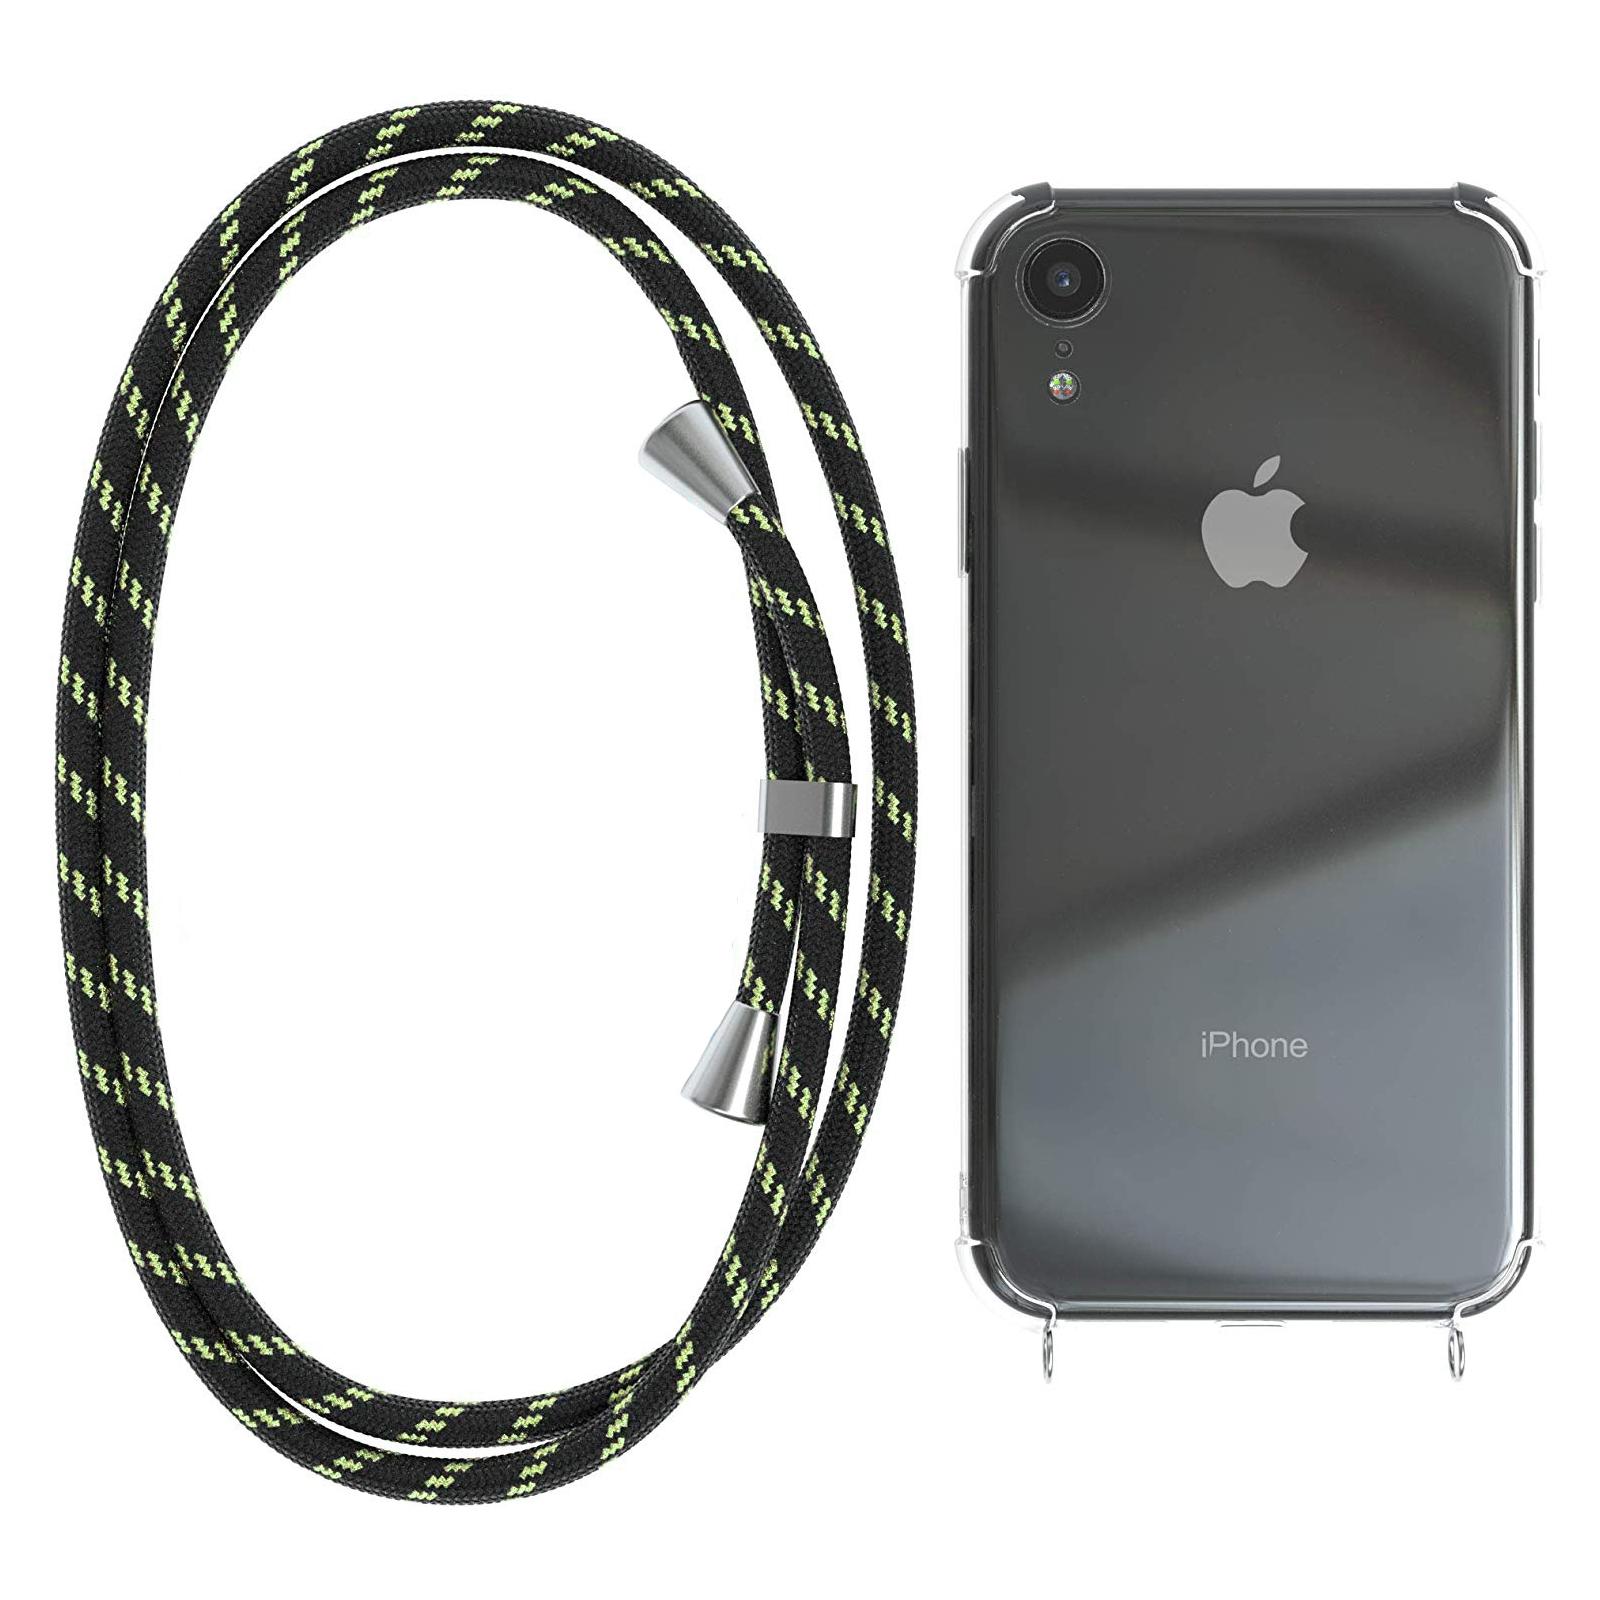 Чехол для моб. телефона BeCover Strap Apple iPhone 11 Pro Black-Green (704247) изображение 3